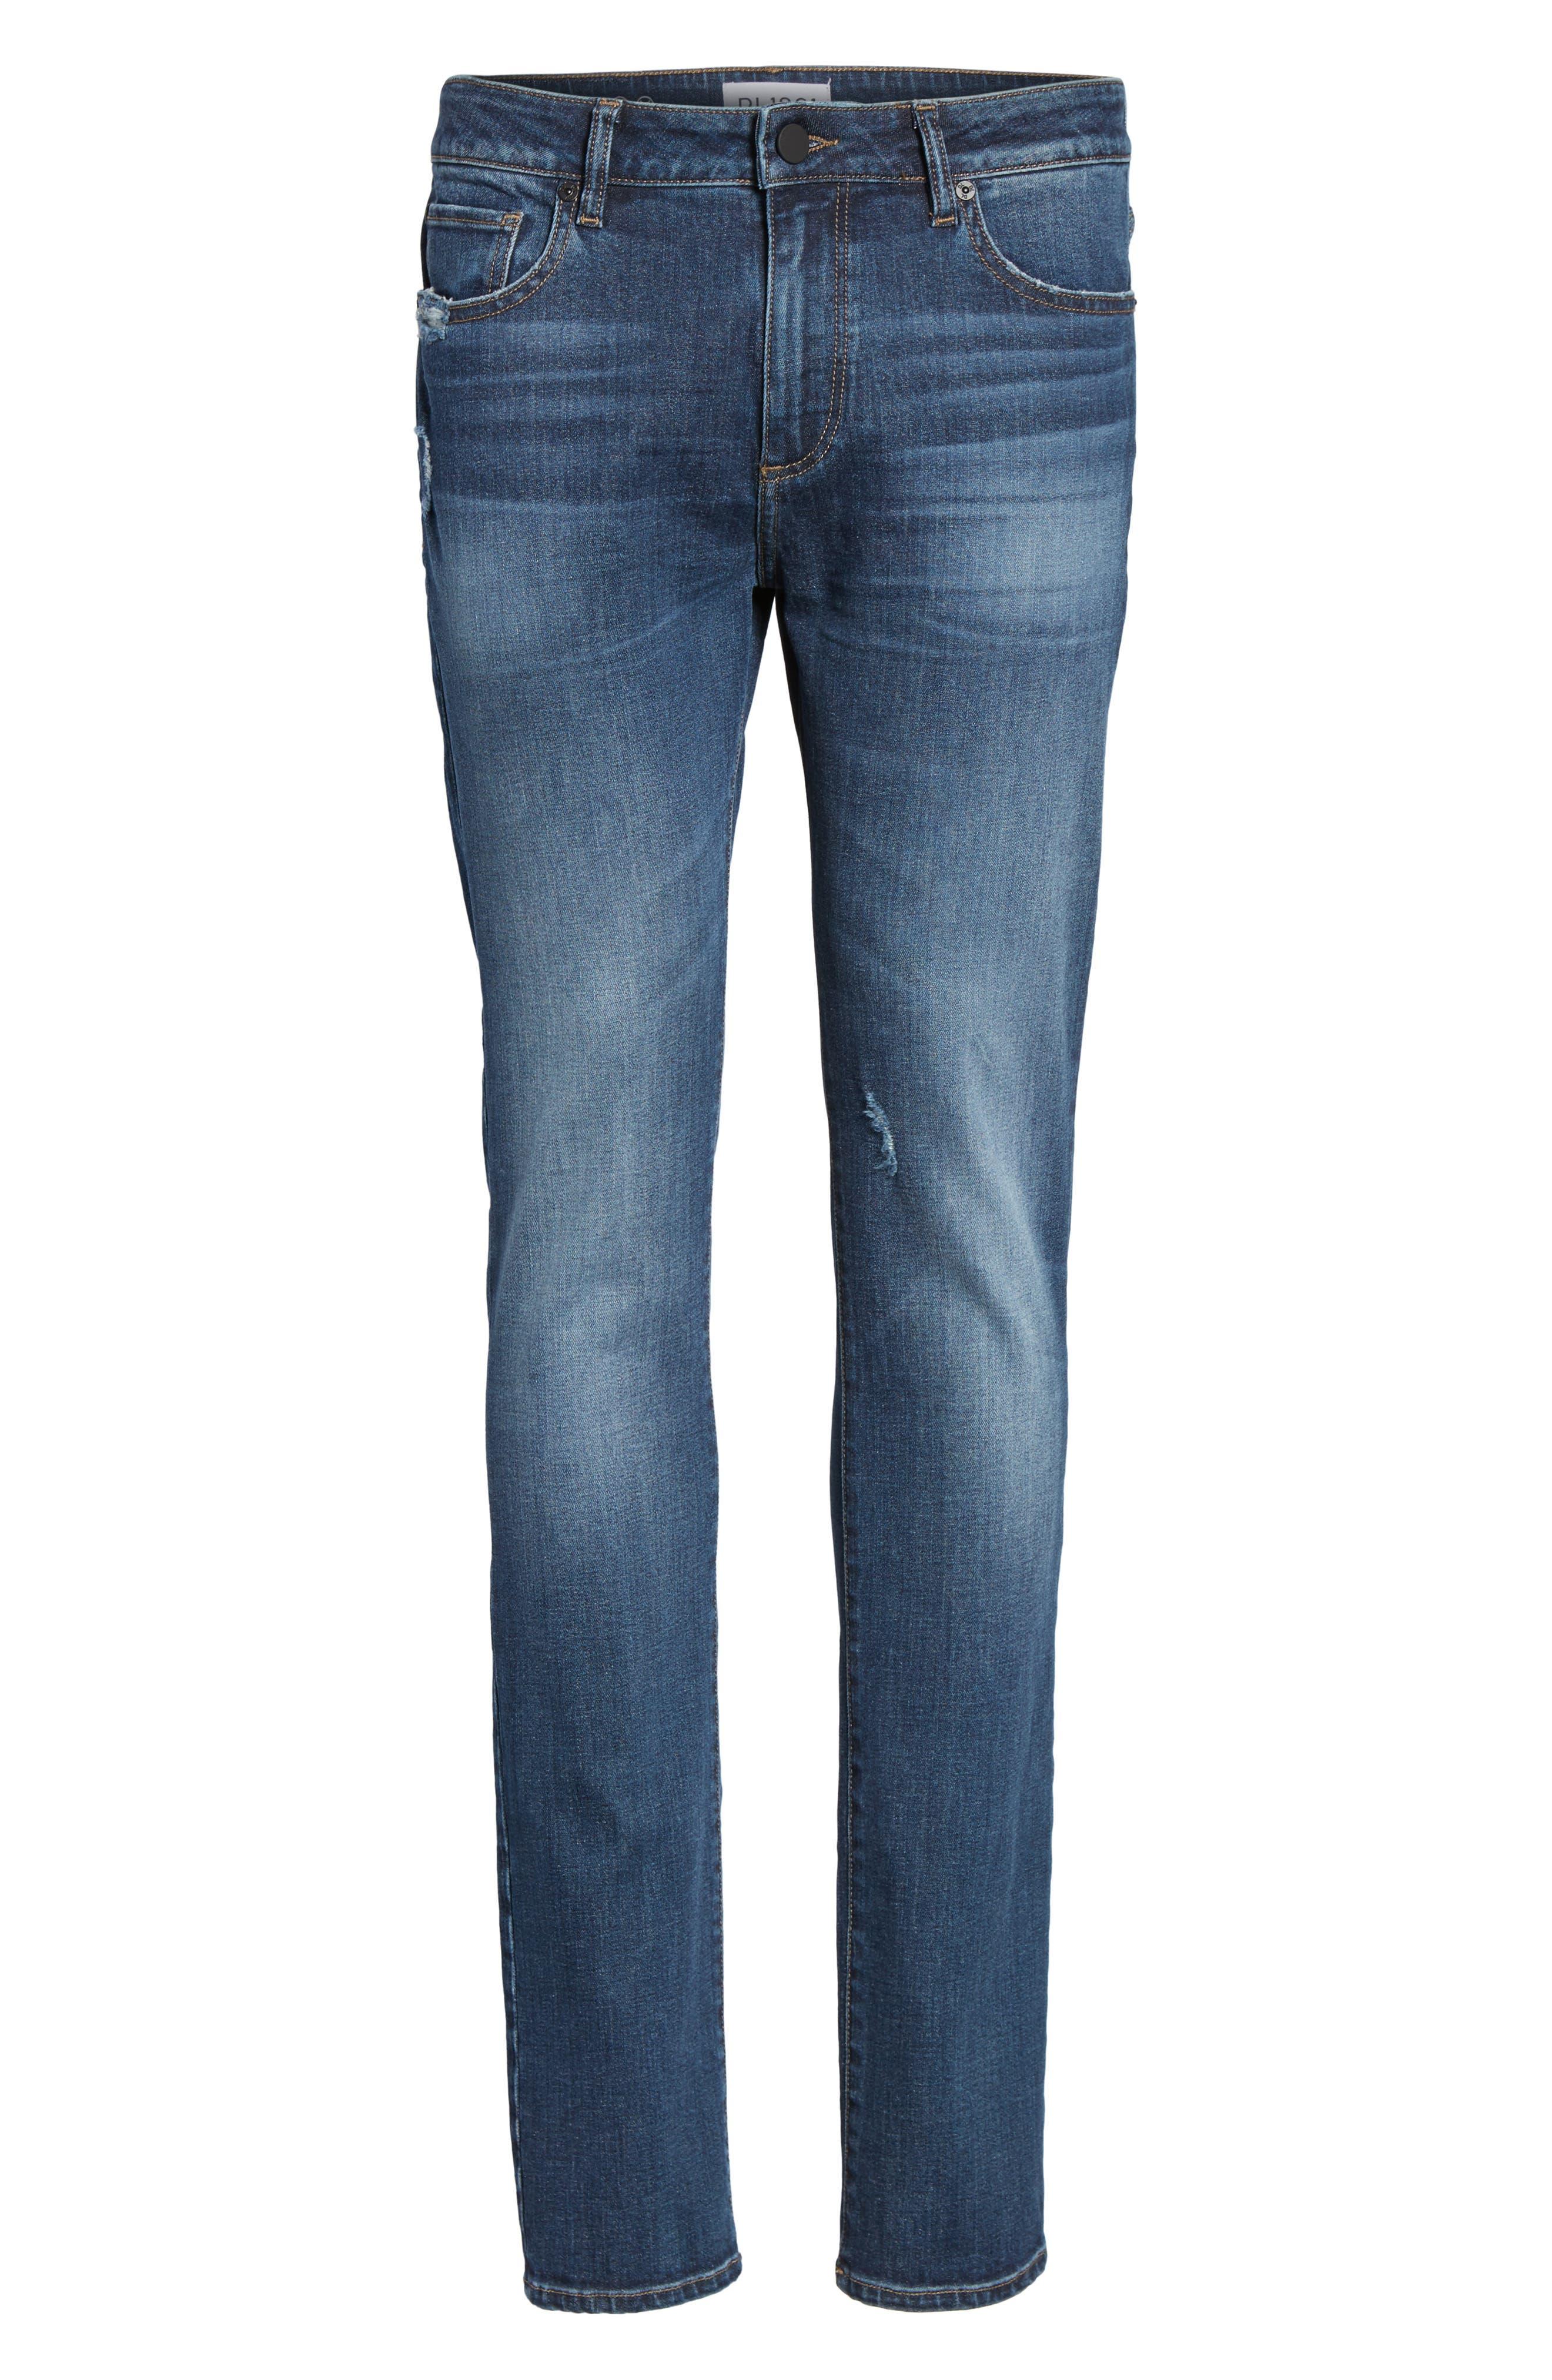 Nick Slim Fit Jeans,                             Alternate thumbnail 6, color,                             406